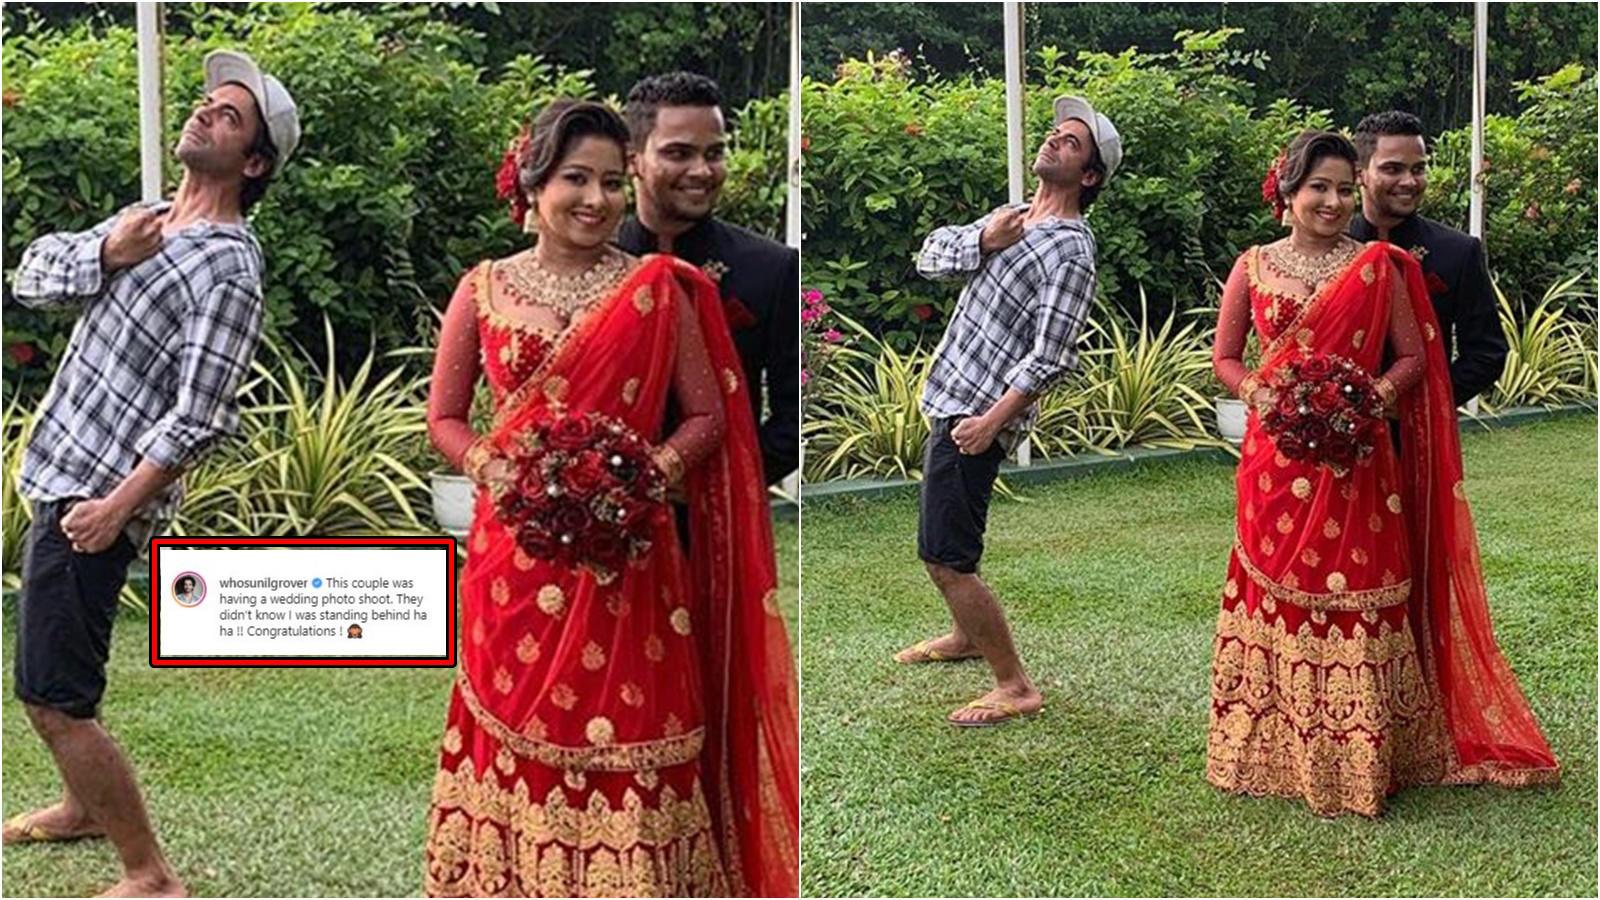 When Sunil Grover photo-bombed a wedding photoshoot